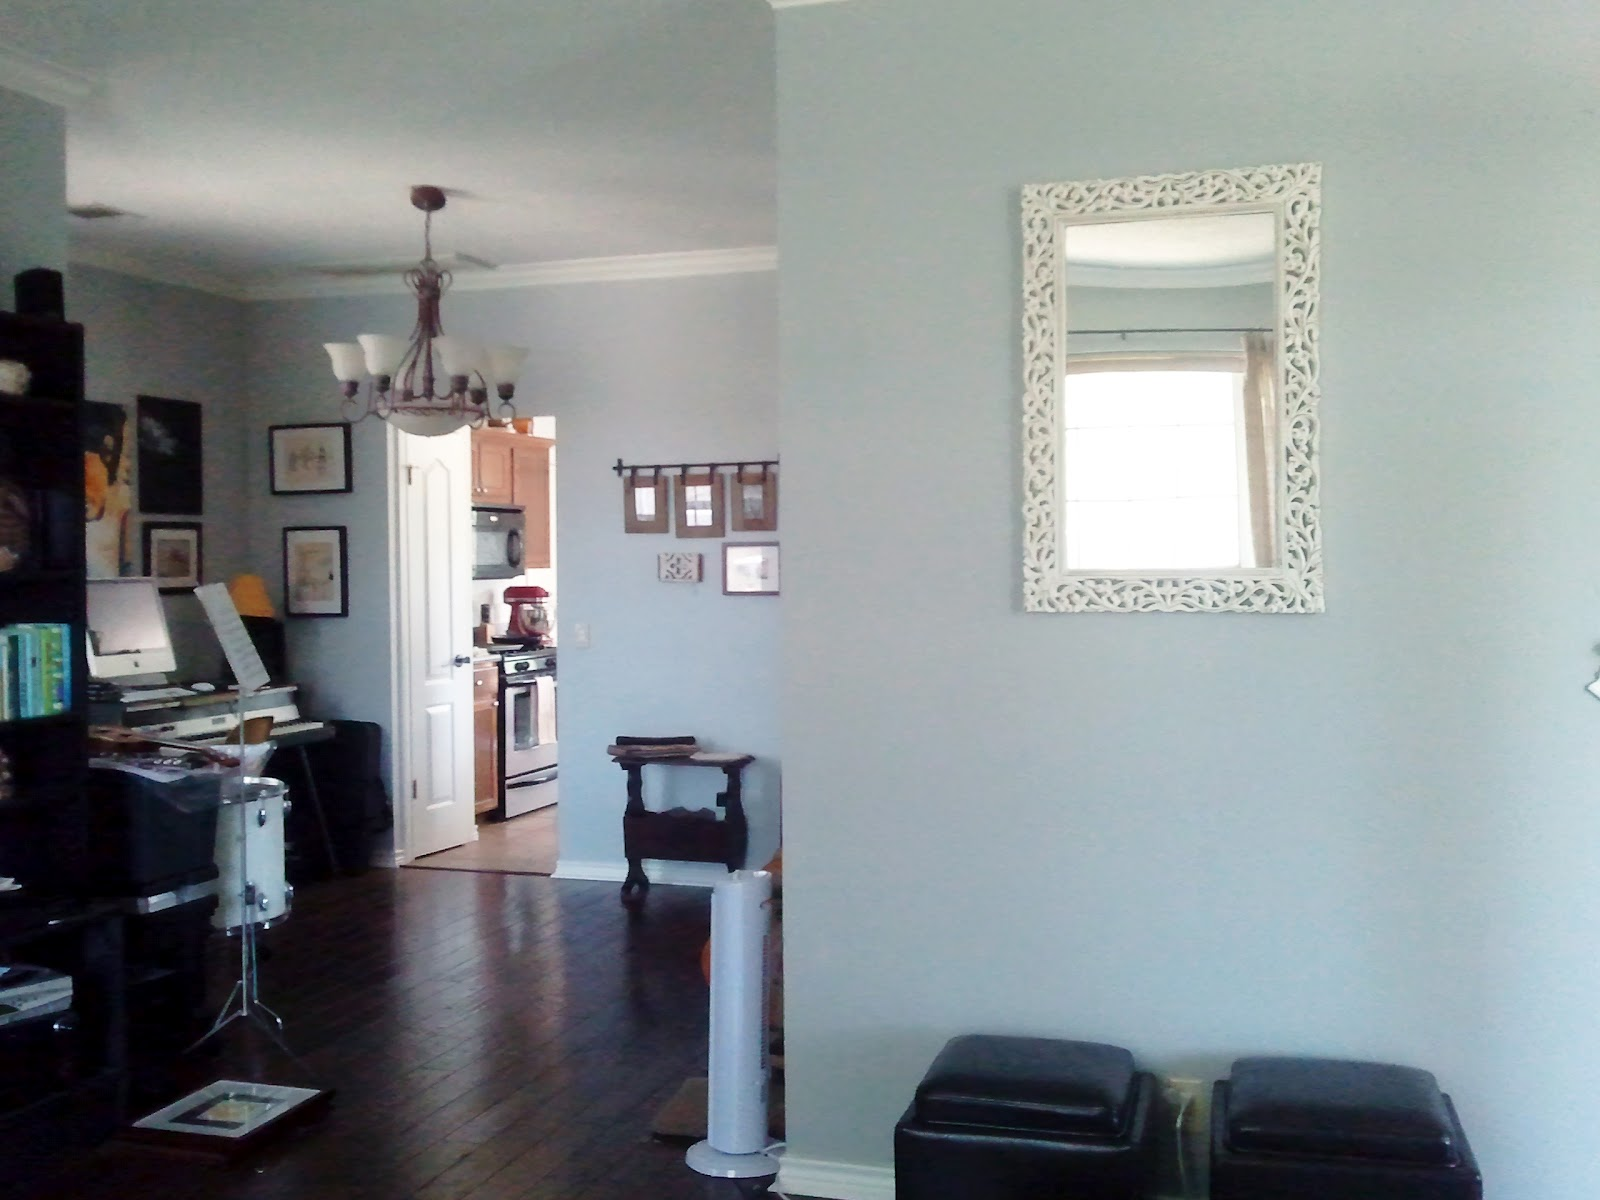 stonewall kitchen com oil rubbed bronze light fixtures c.b.i.d. home decor and design: warm grey